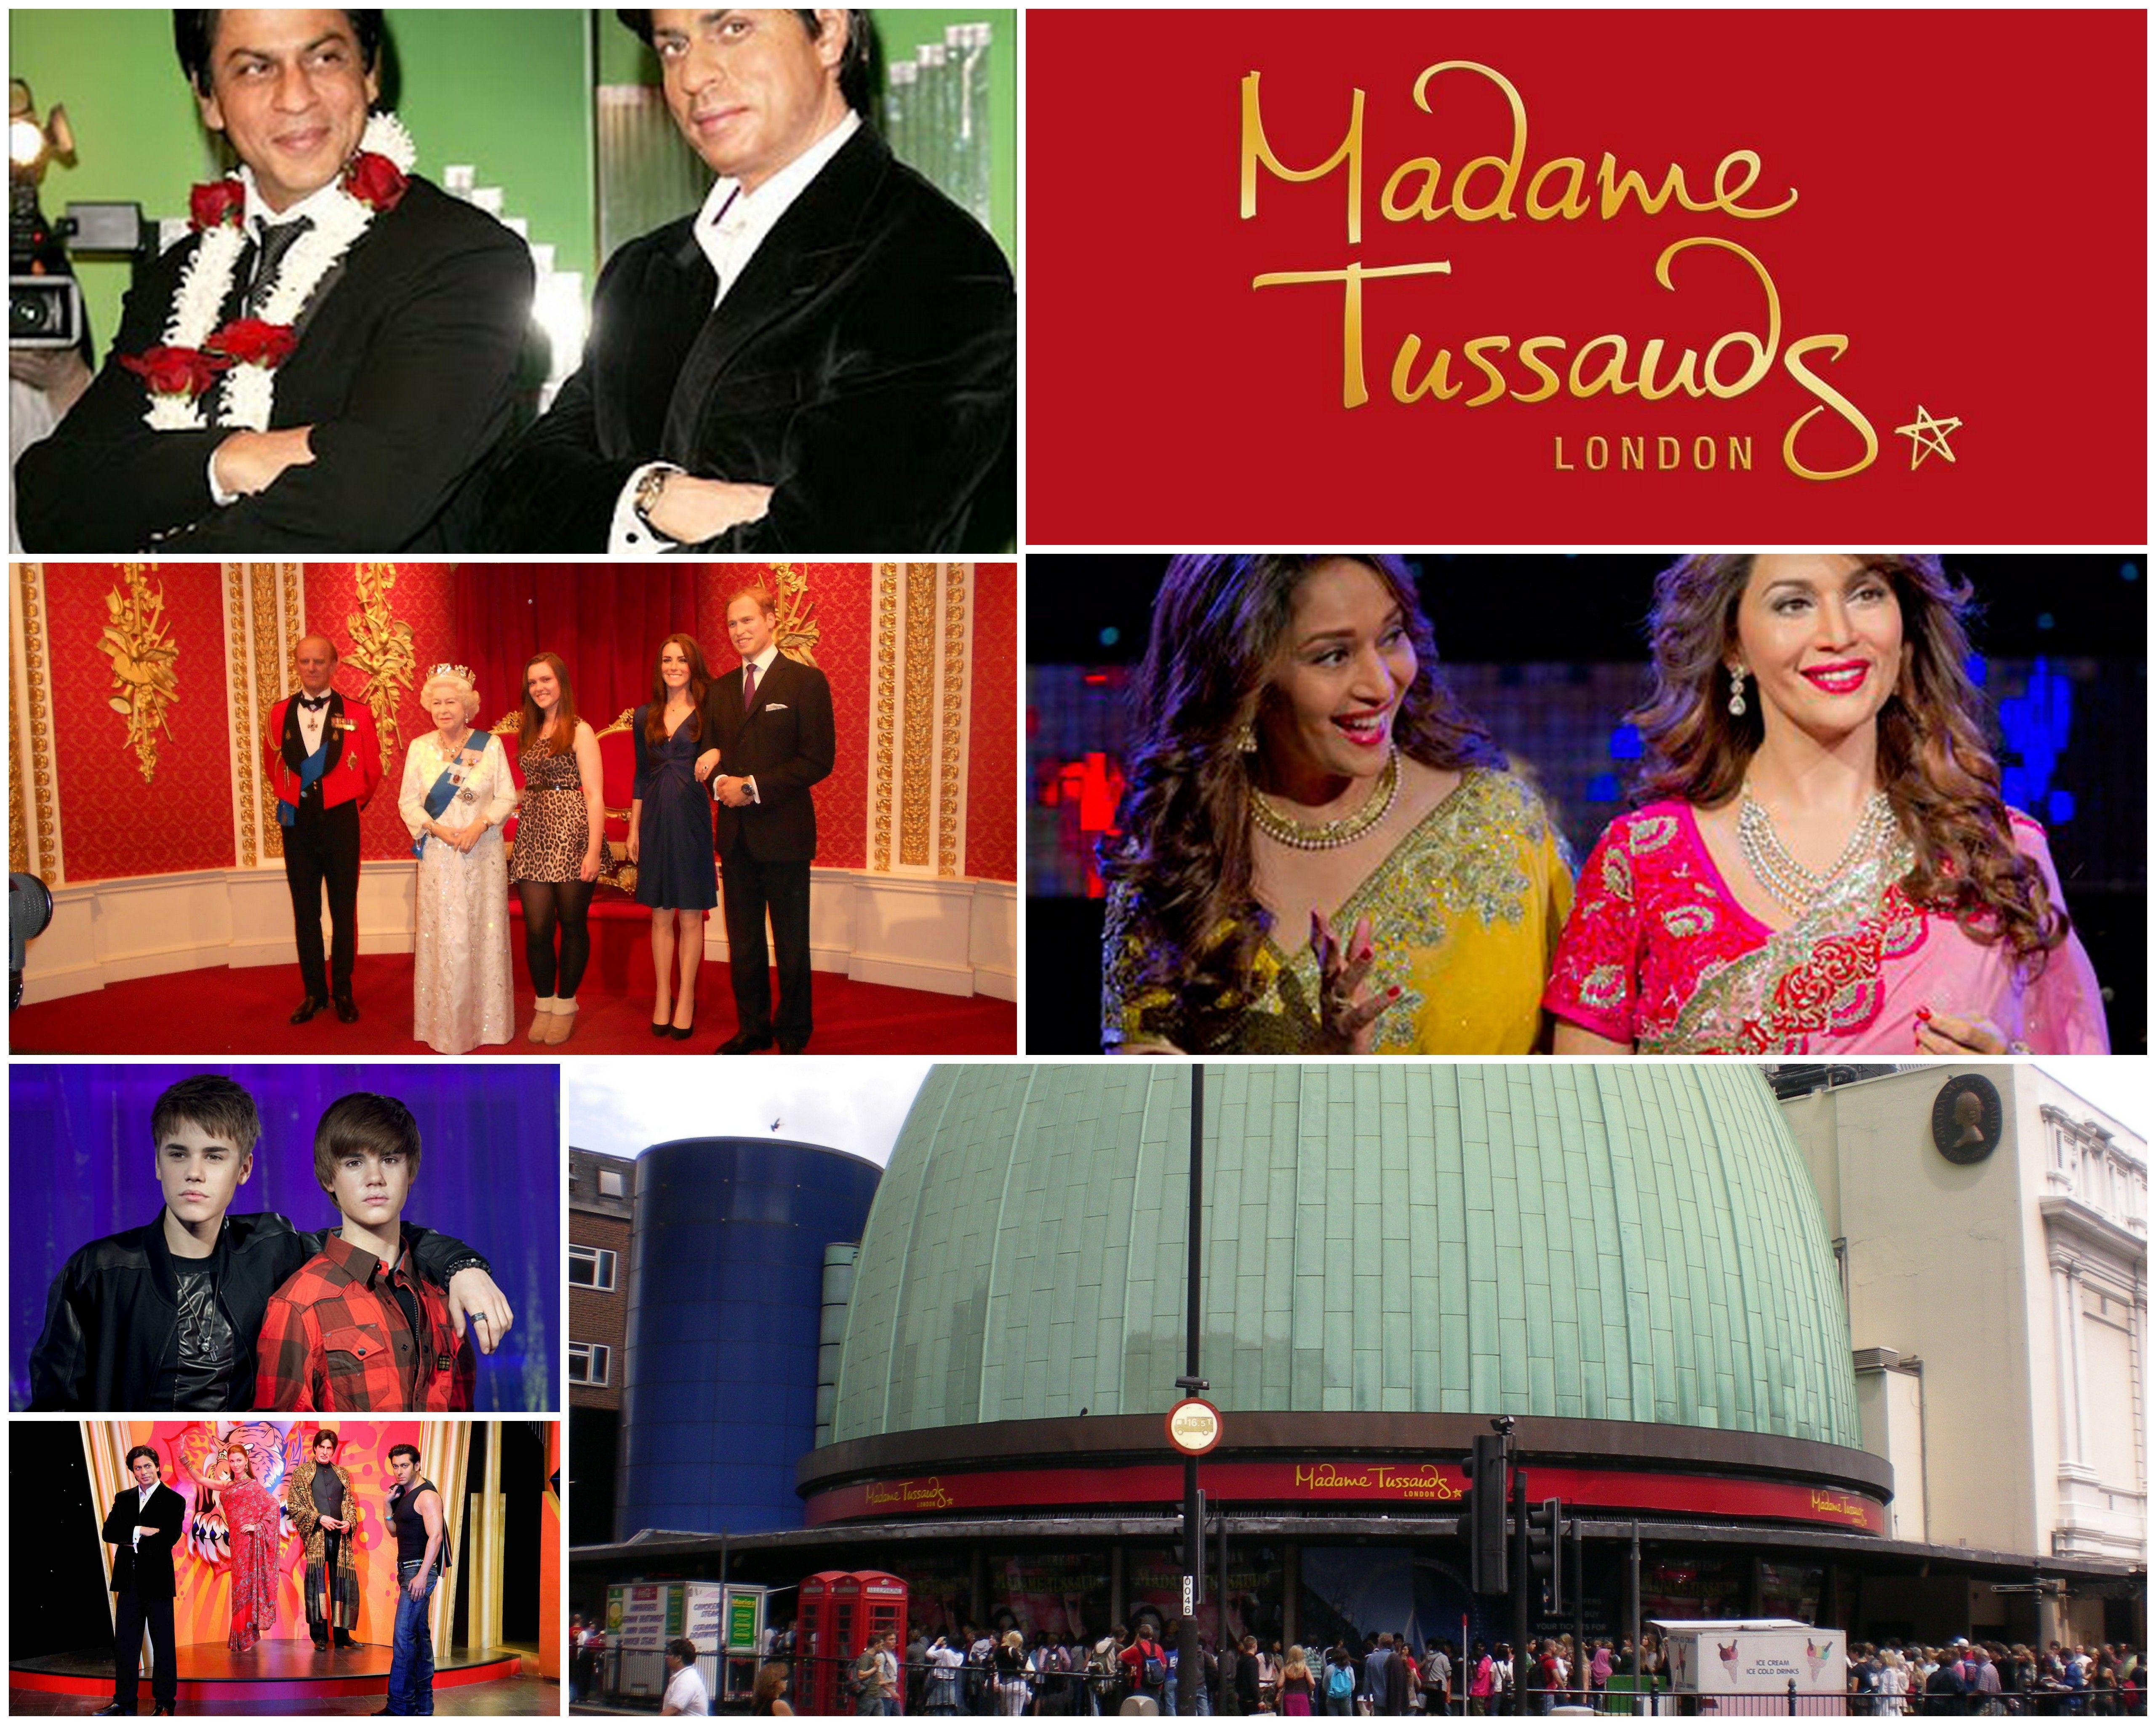 Oxford Street London London Tourist Guide Madame Tussauds Tussauds London